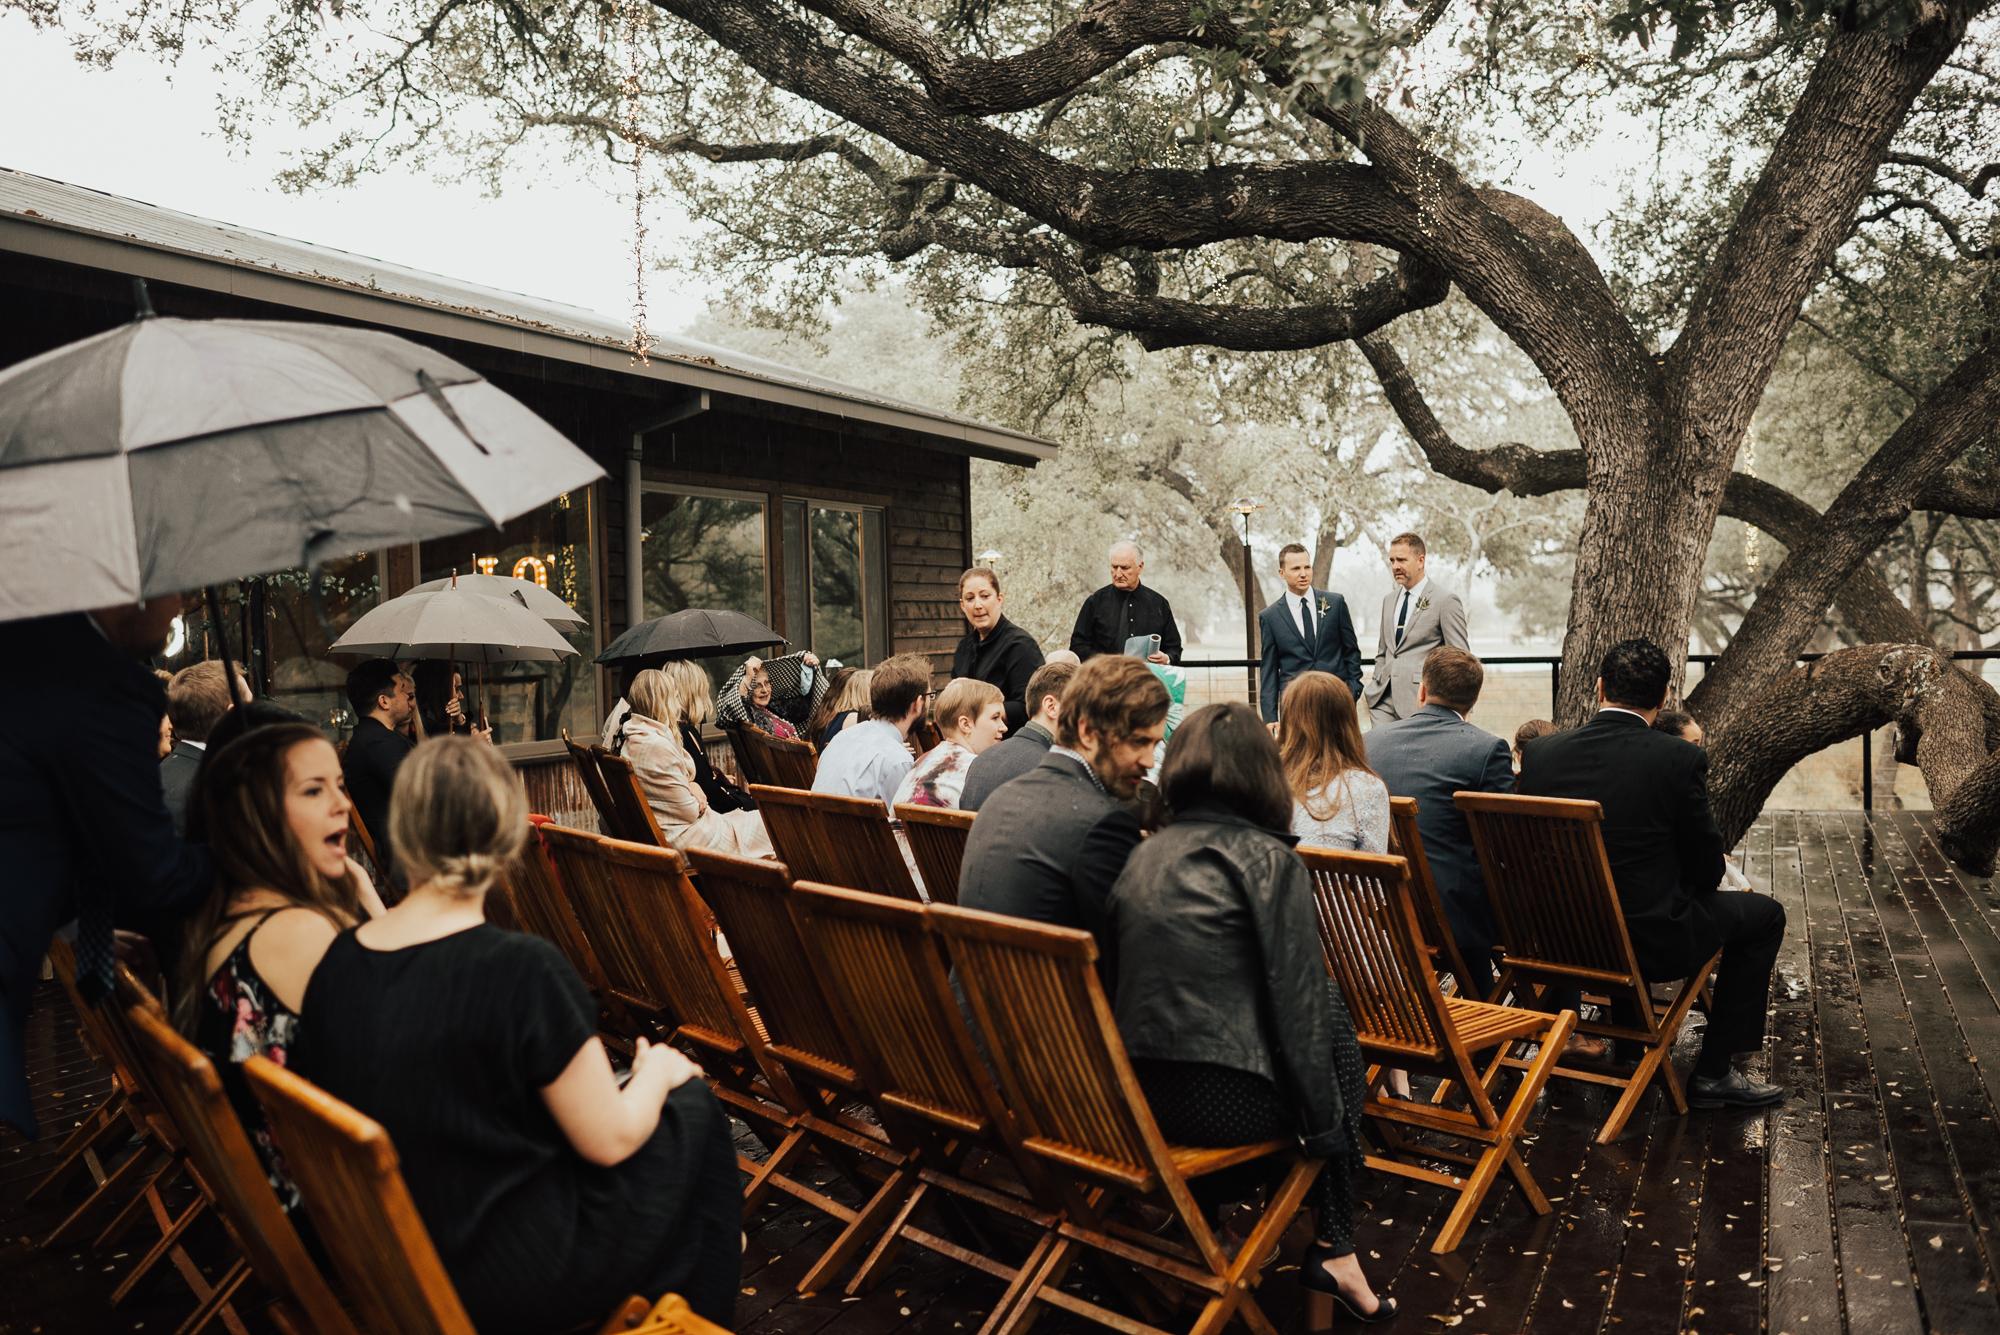 camp-lucy-wedding-185.jpg